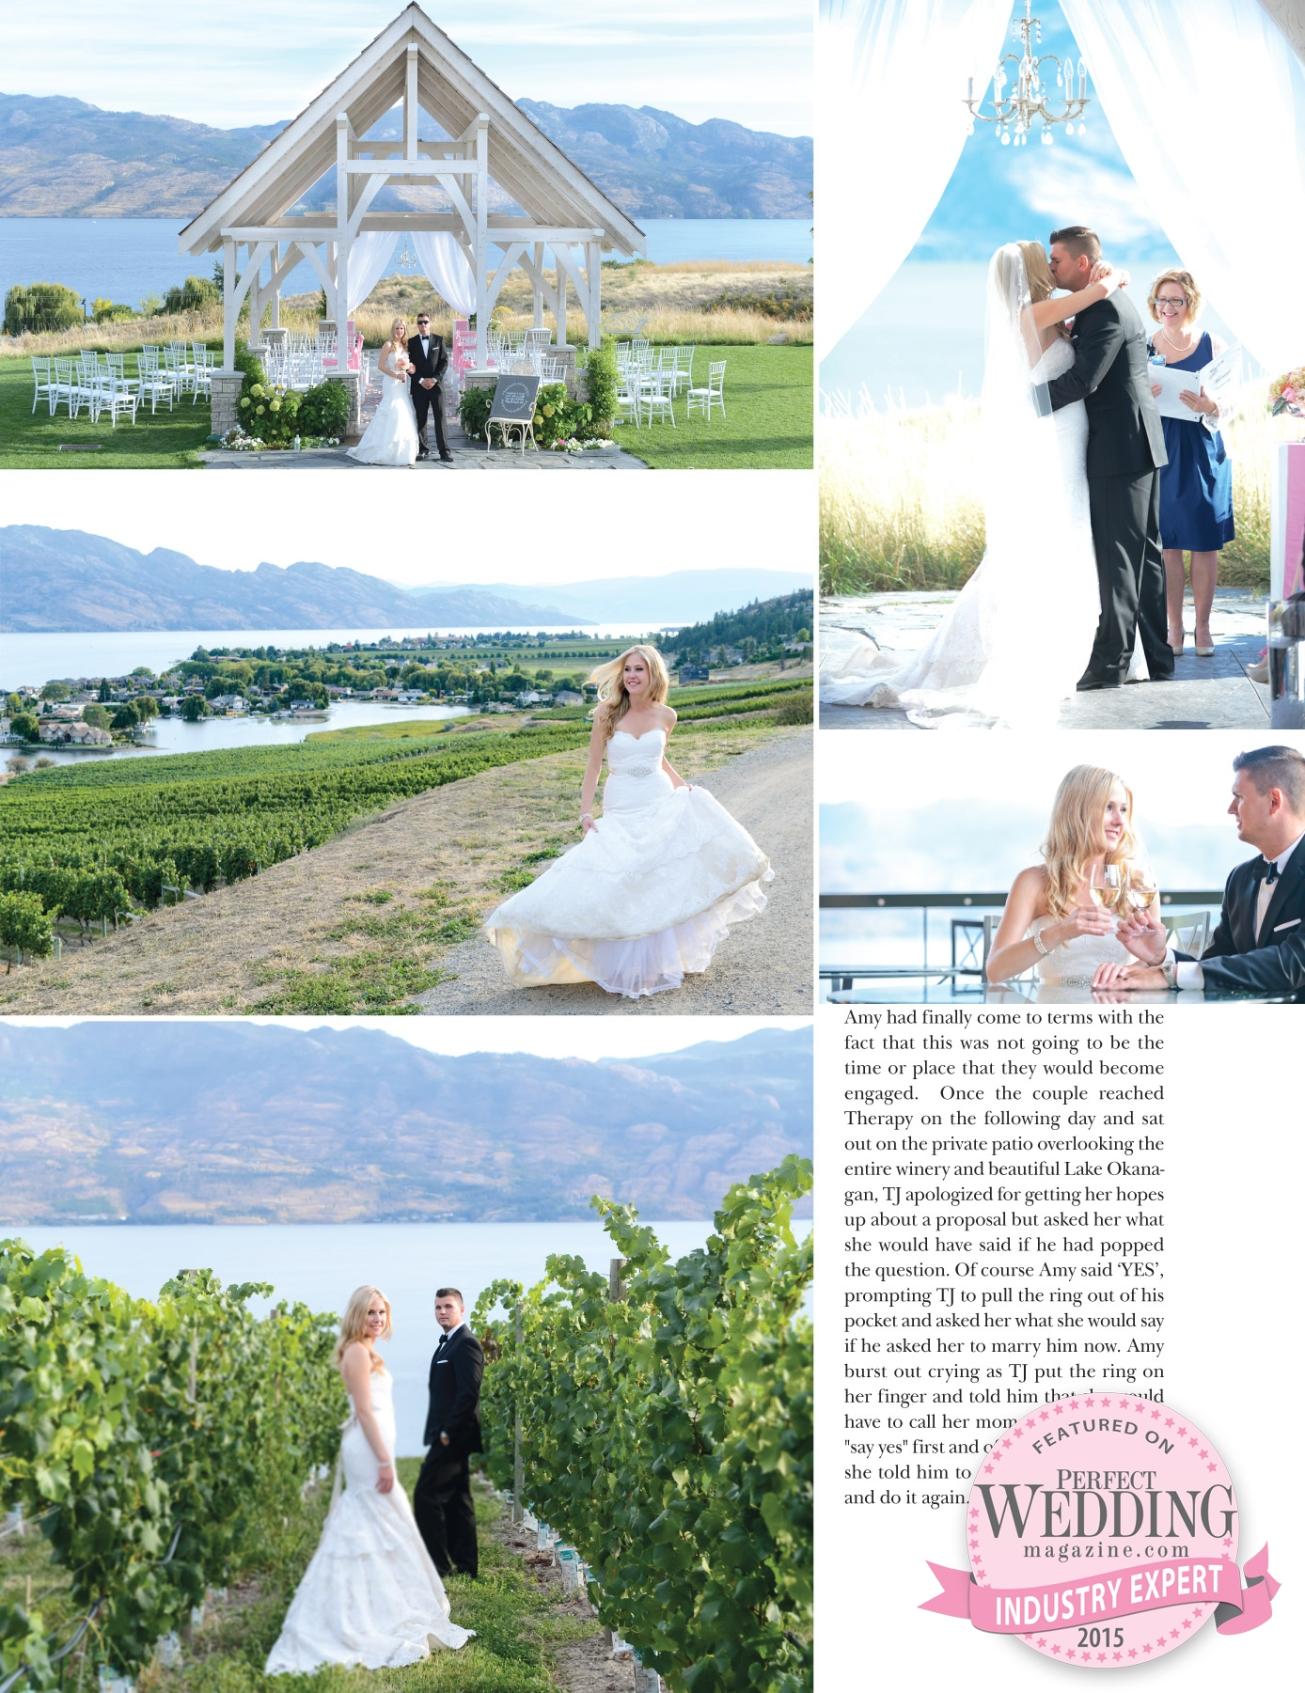 Sanctuary Gardens & Quails Gate Winery - West Kelowna Wedding Venues